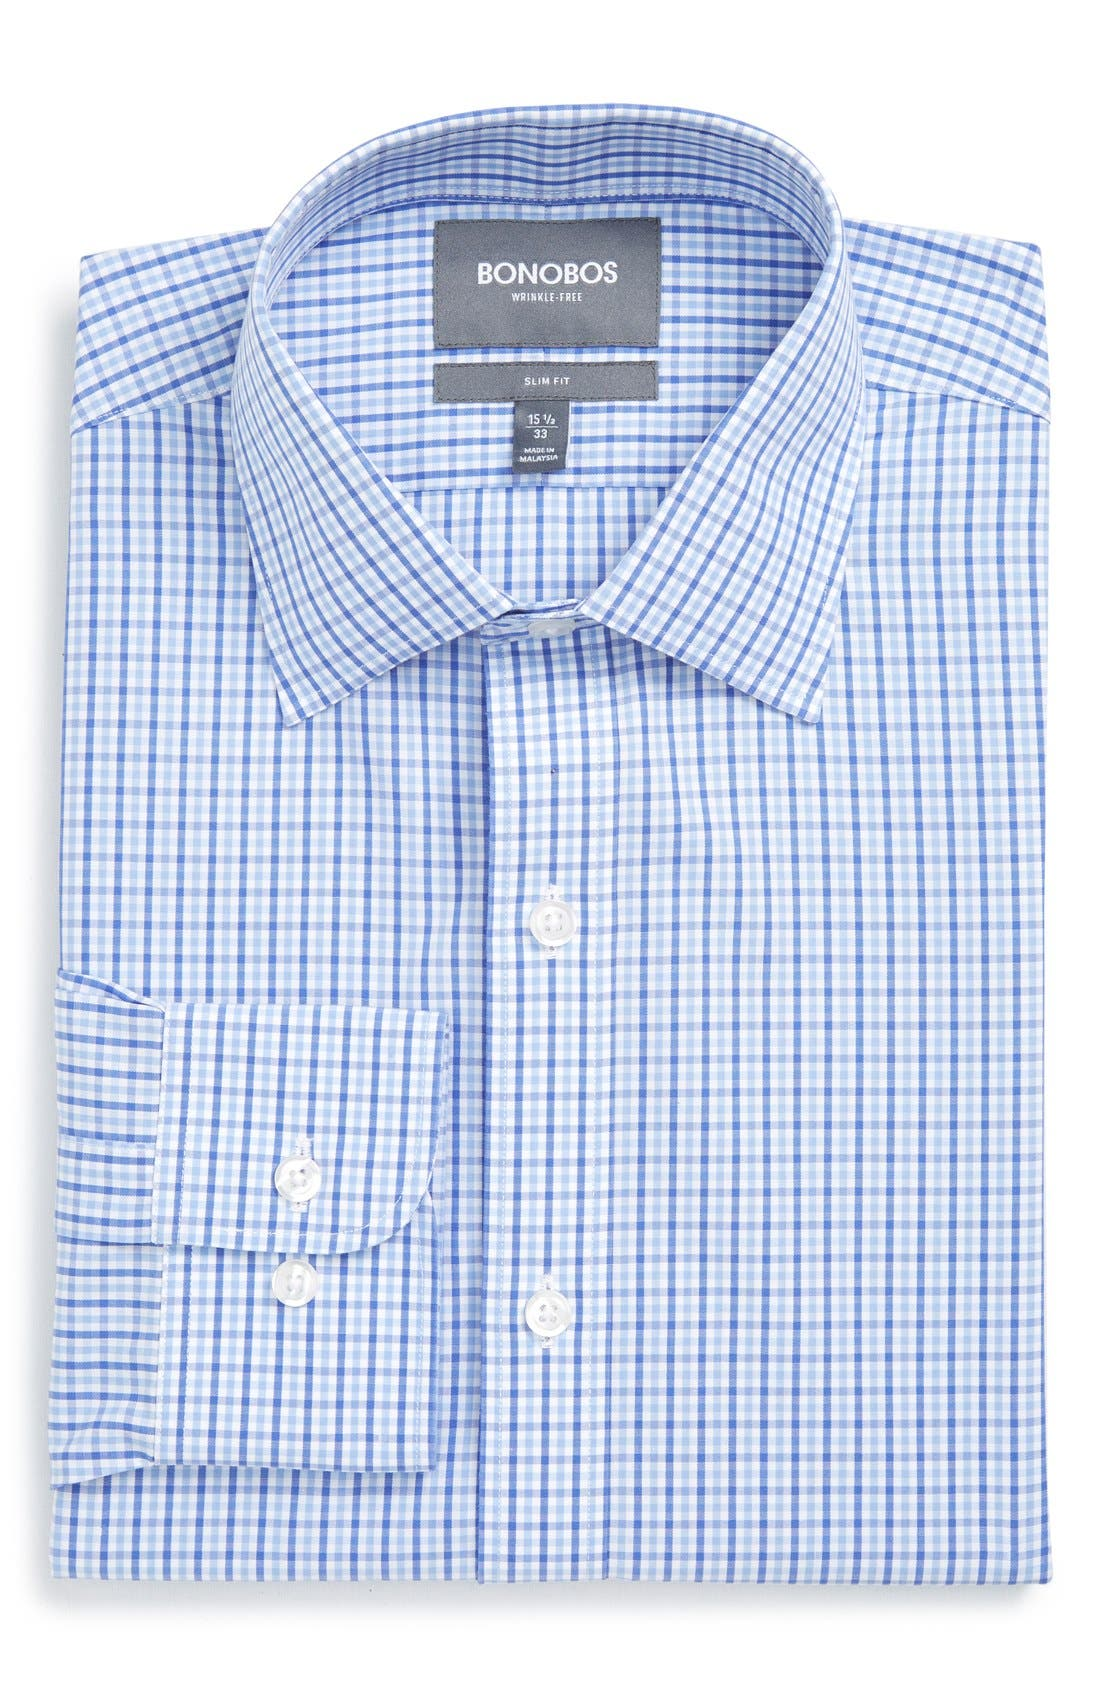 Slim Fit Wrinkle Free Check Dress Shirt,                             Alternate thumbnail 4, color,                             Pale Blue